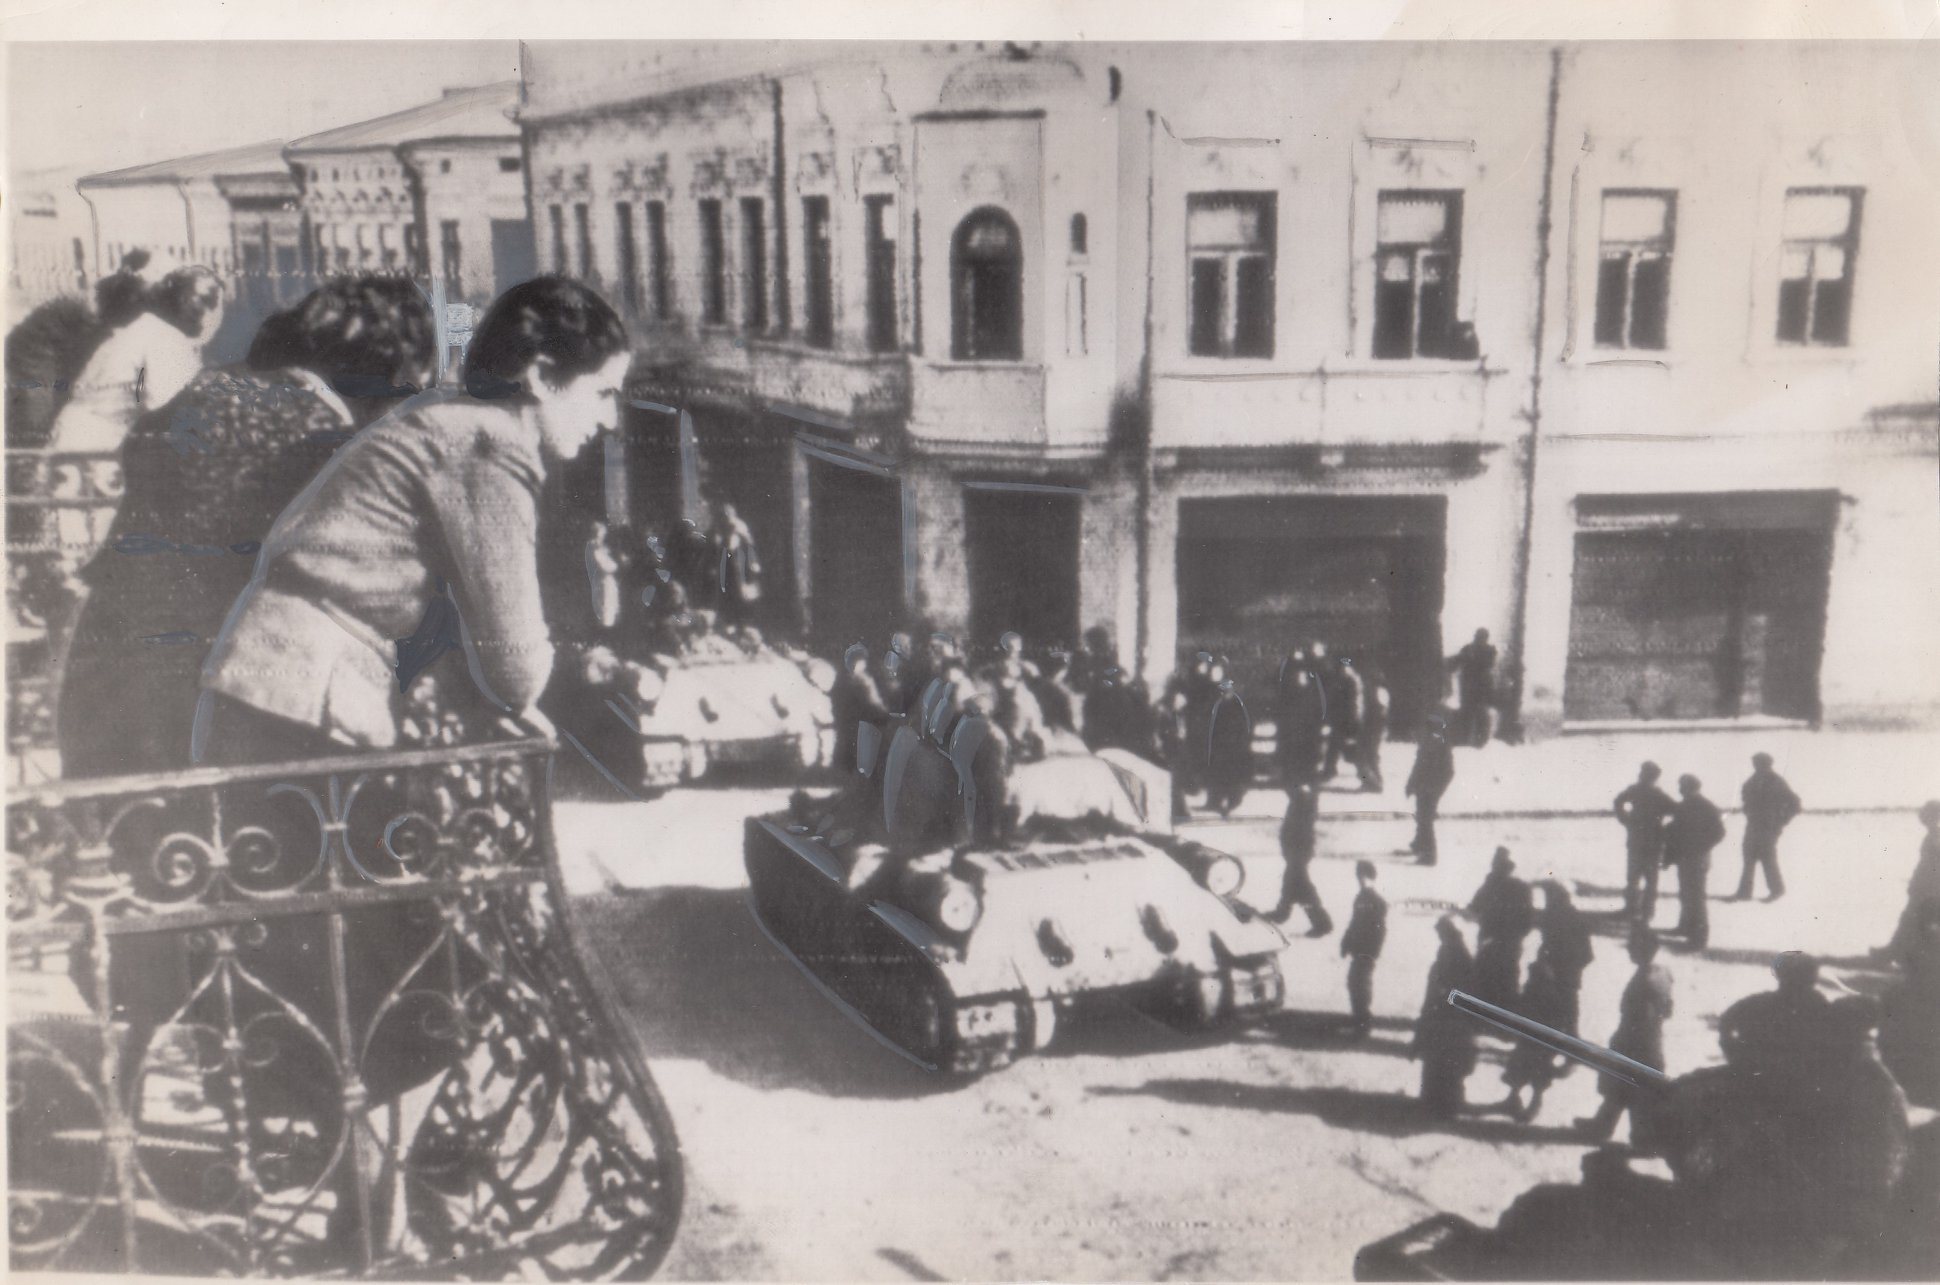 https://ahe-ro.s3.amazonaws.com/4498/Intrarea-trupelor-sovietice-in-Botosani.--1944.jpg